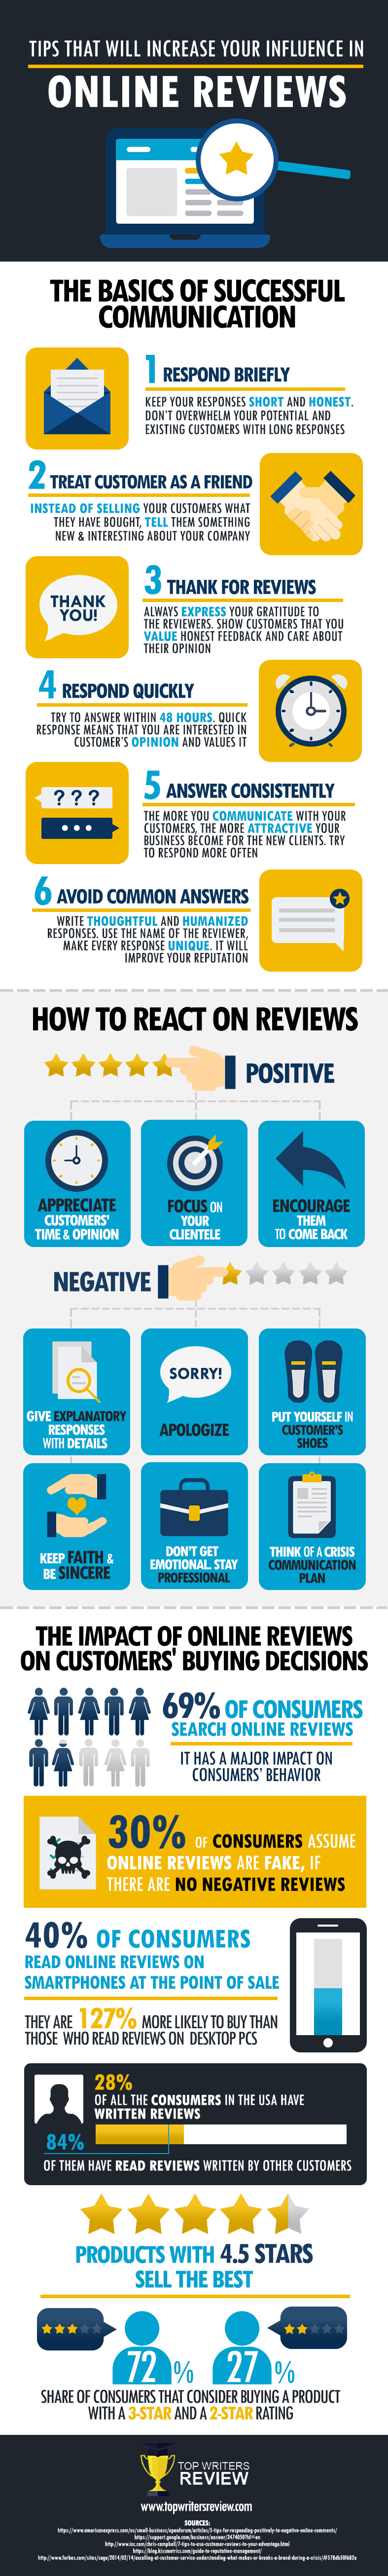 Responding-to-Customer-Reviews